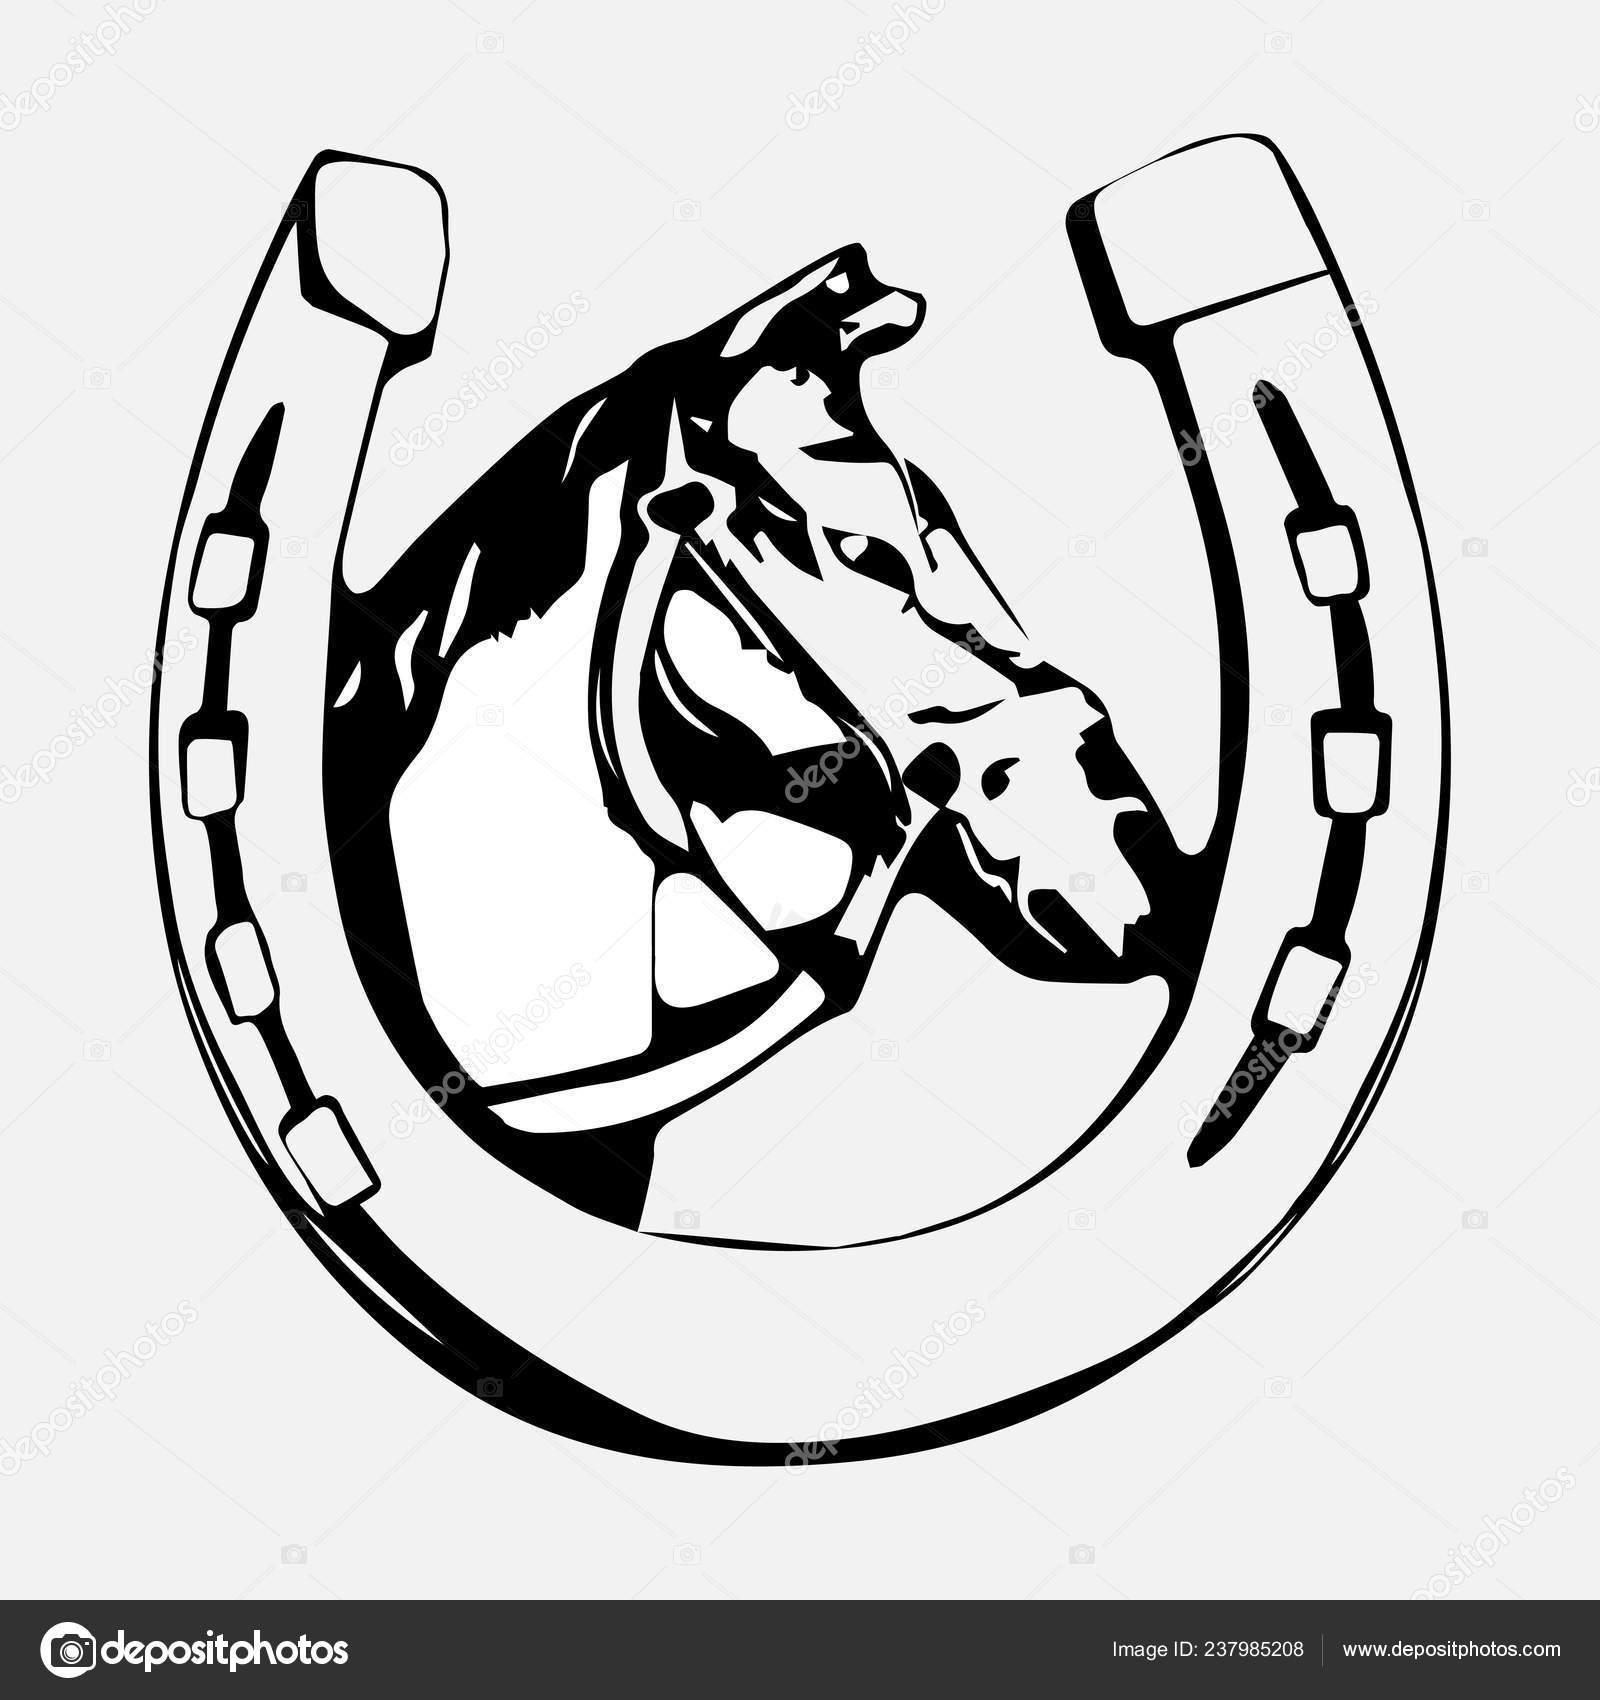 Icon Horseshoe Horse Head Horse Head Horseshoe Icon Horse Silhouette Logo Design Vector Image Stock Vector C Igor170806 Gmail Com 237985208